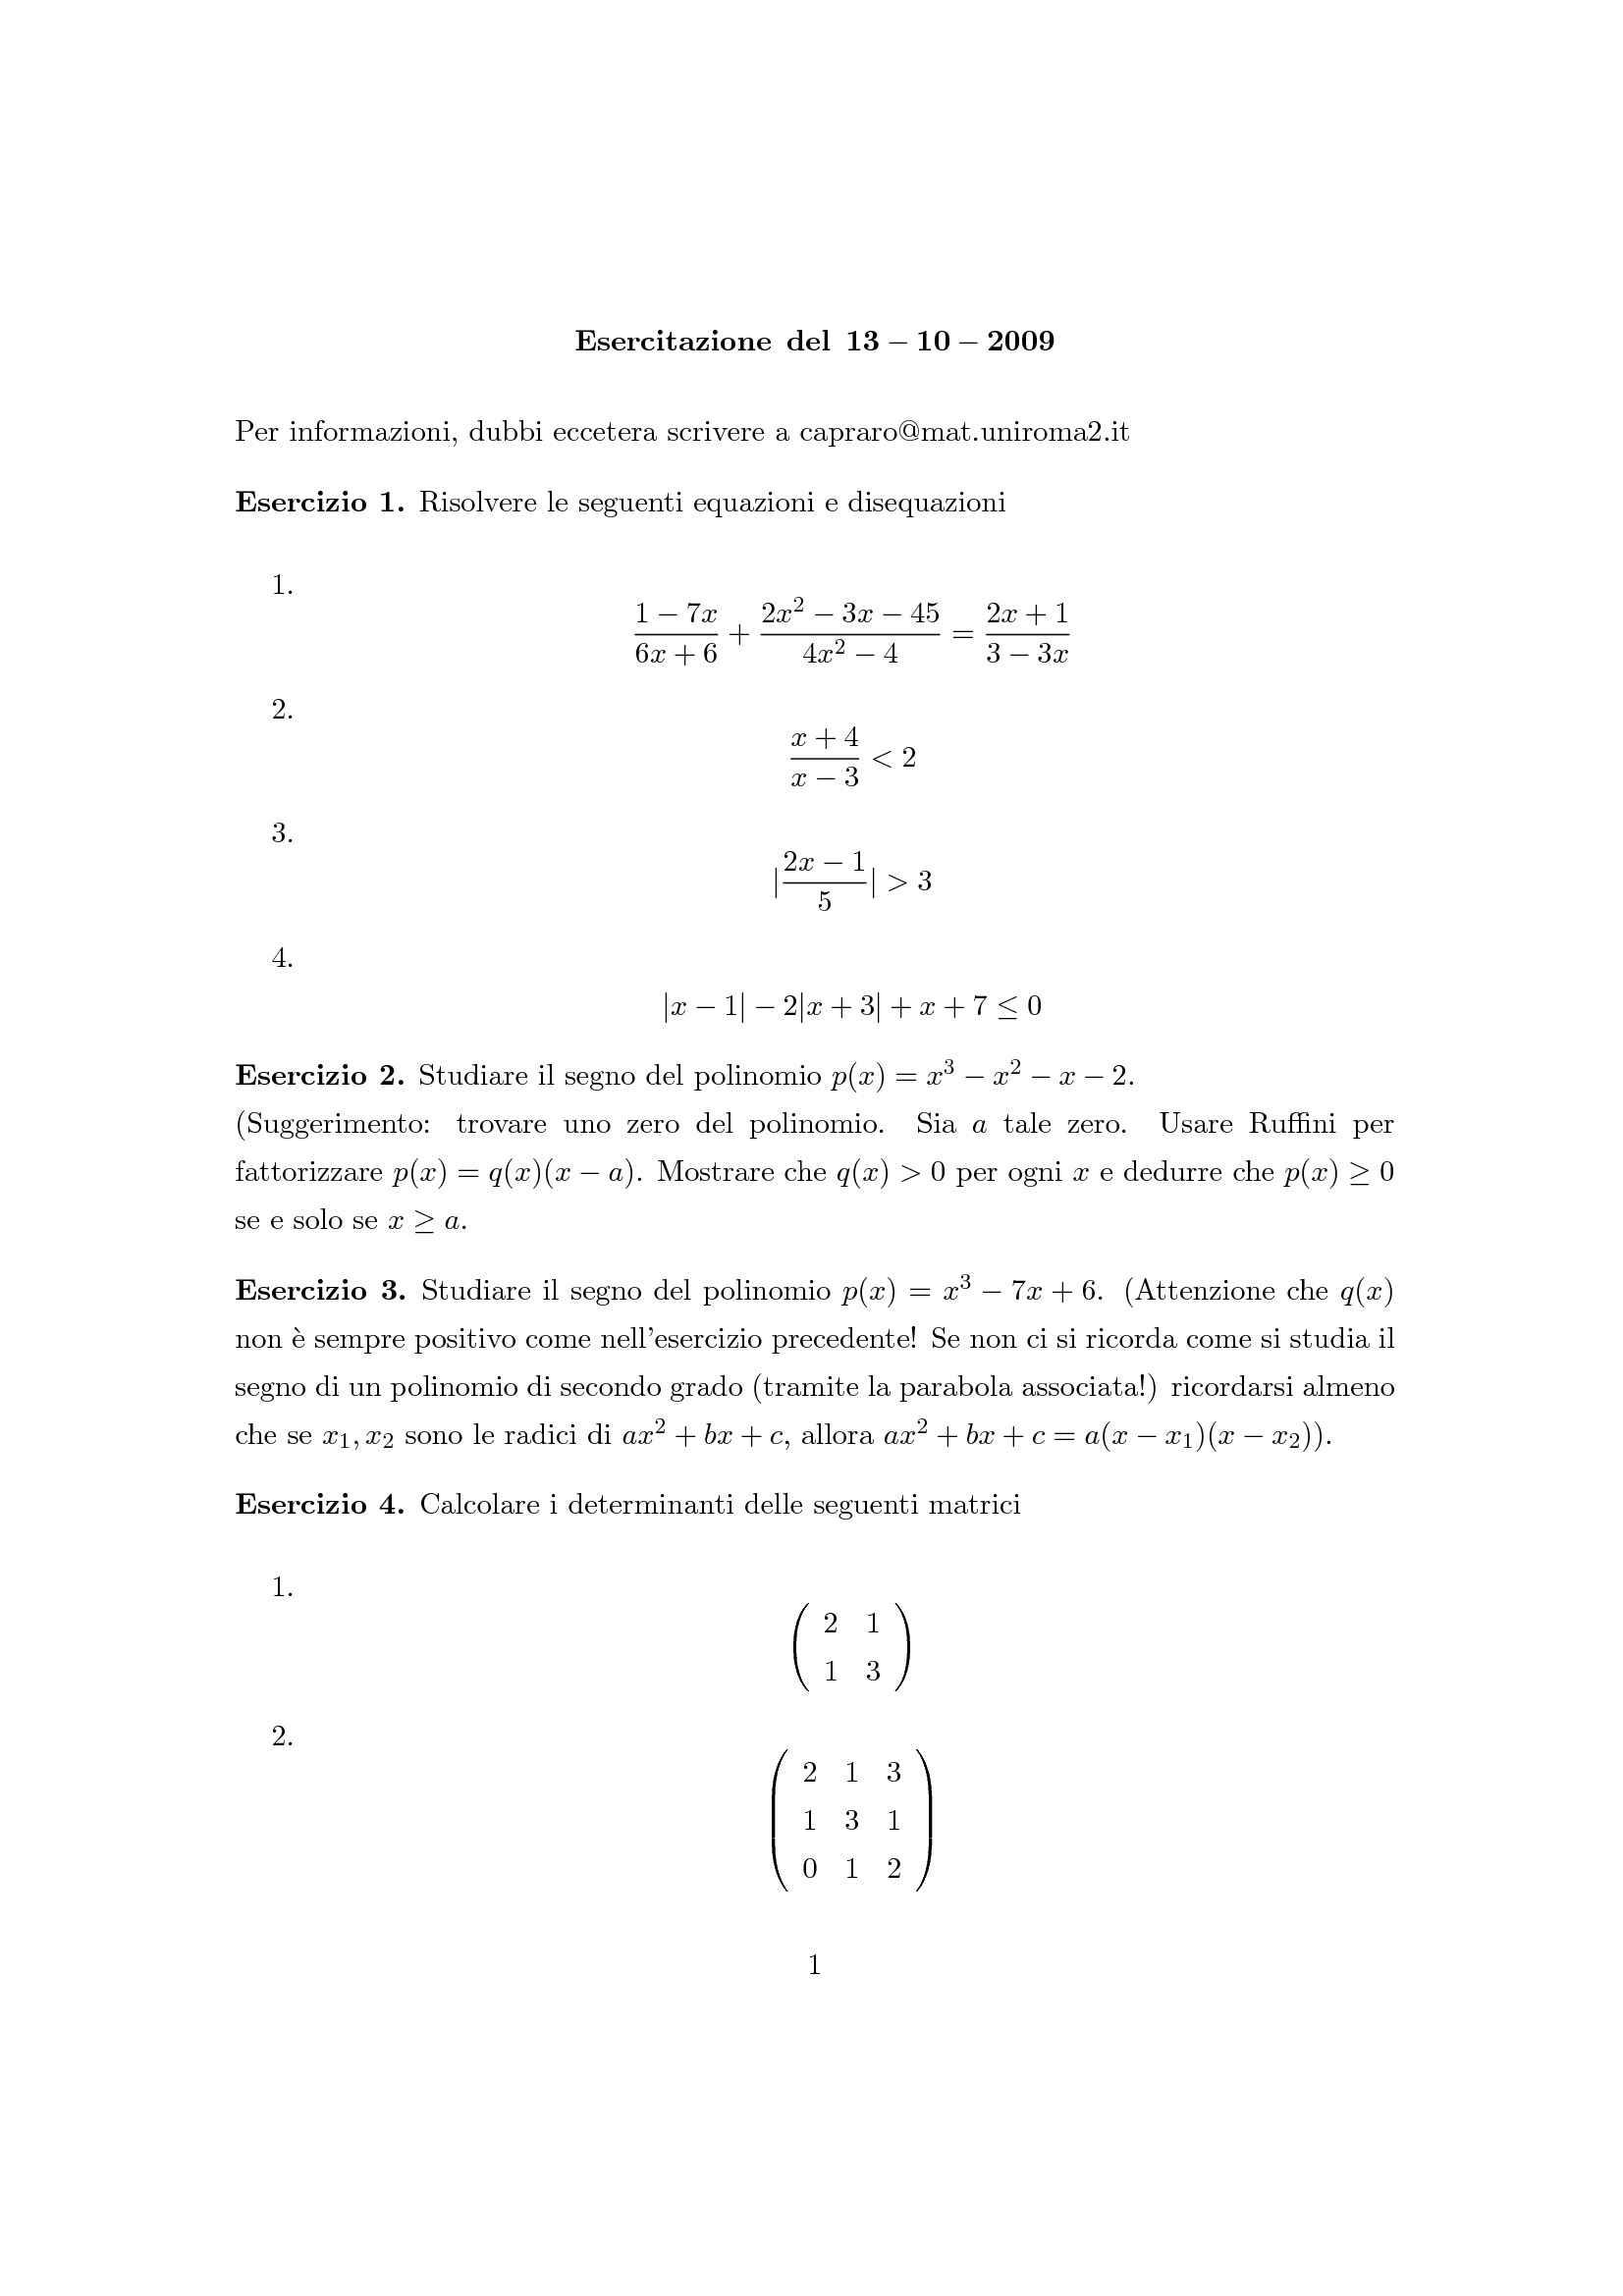 Matematica Generale - Matrici, Ruffini, sistema lineare parametrico